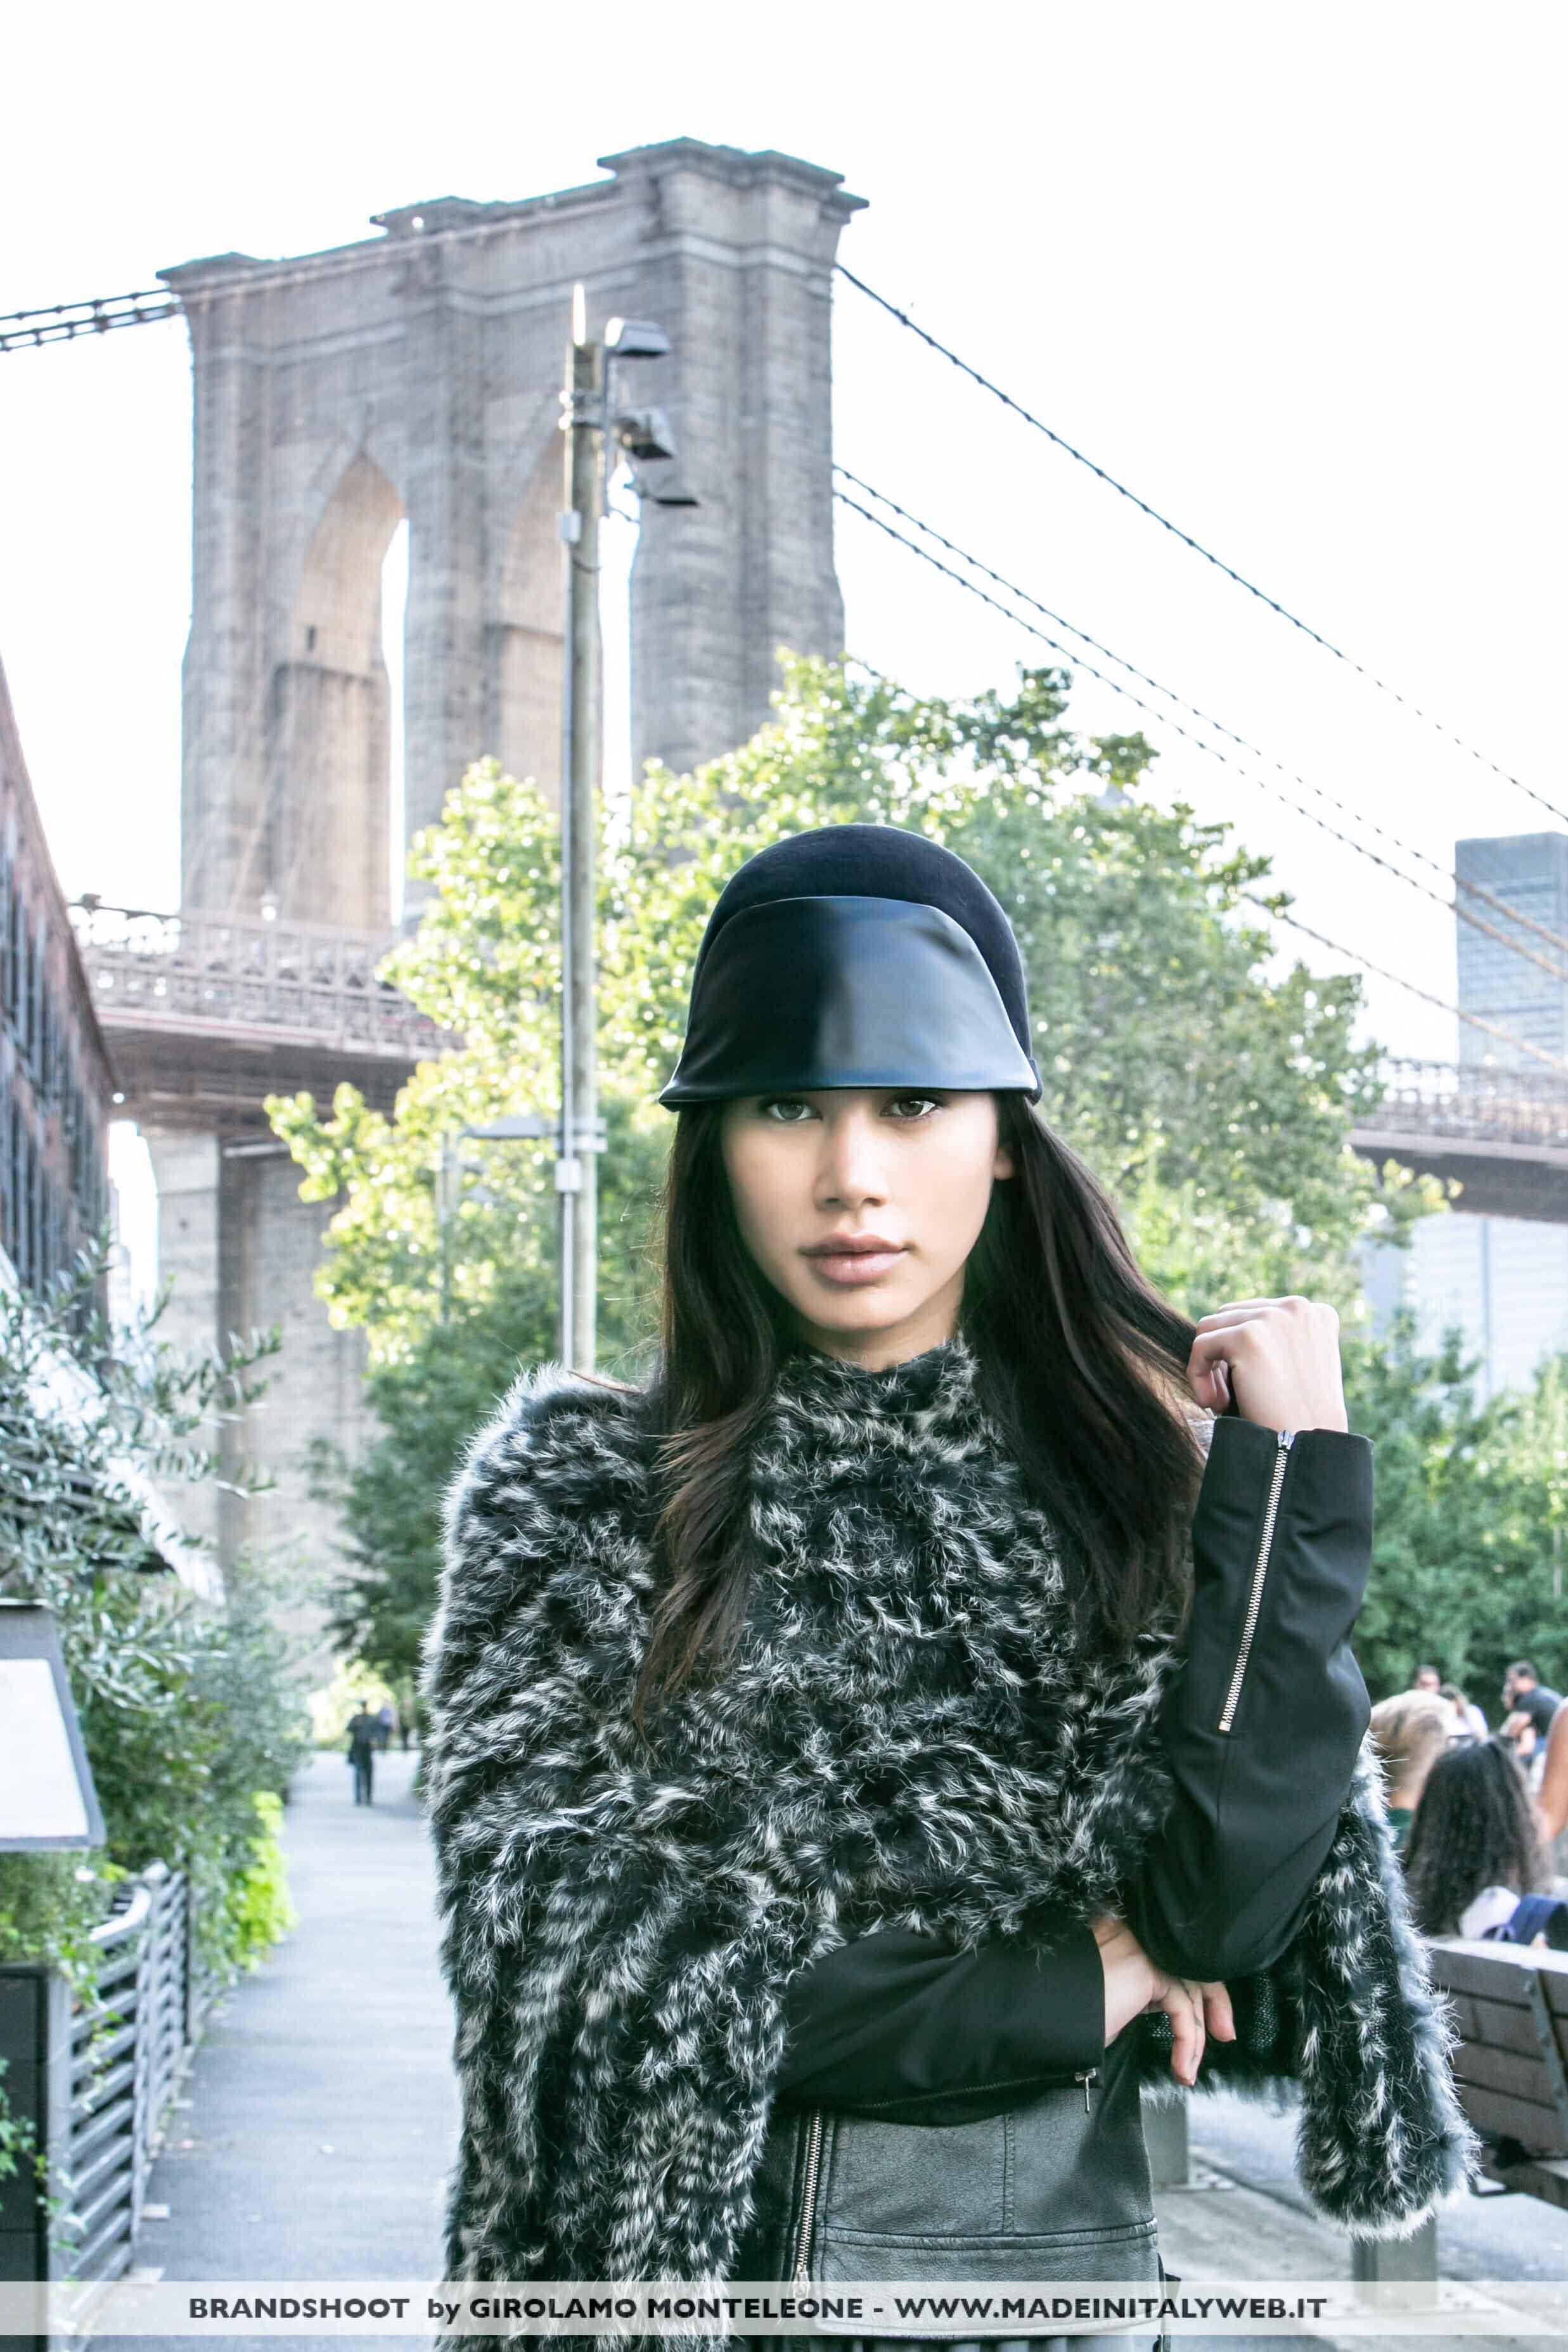 fashion street photographer NEWYORK ROMA CADOCAP NEW_YORK_GIROLAMO_MONTELEONE_2018ottobre032306561530_IMG_9330